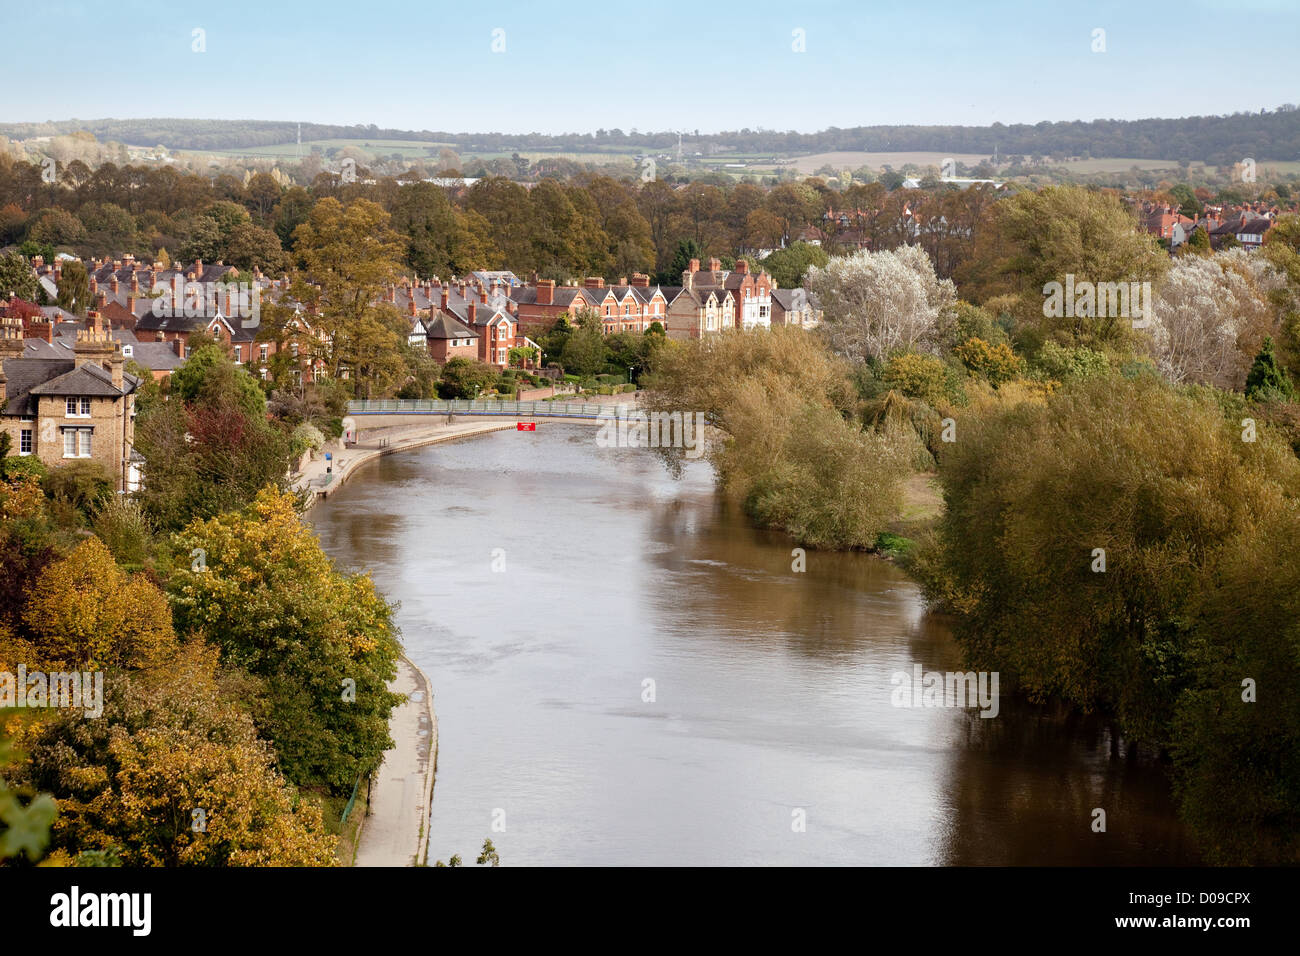 The River Severn at Shrewsbury, Shropshire England UK - Stock Image